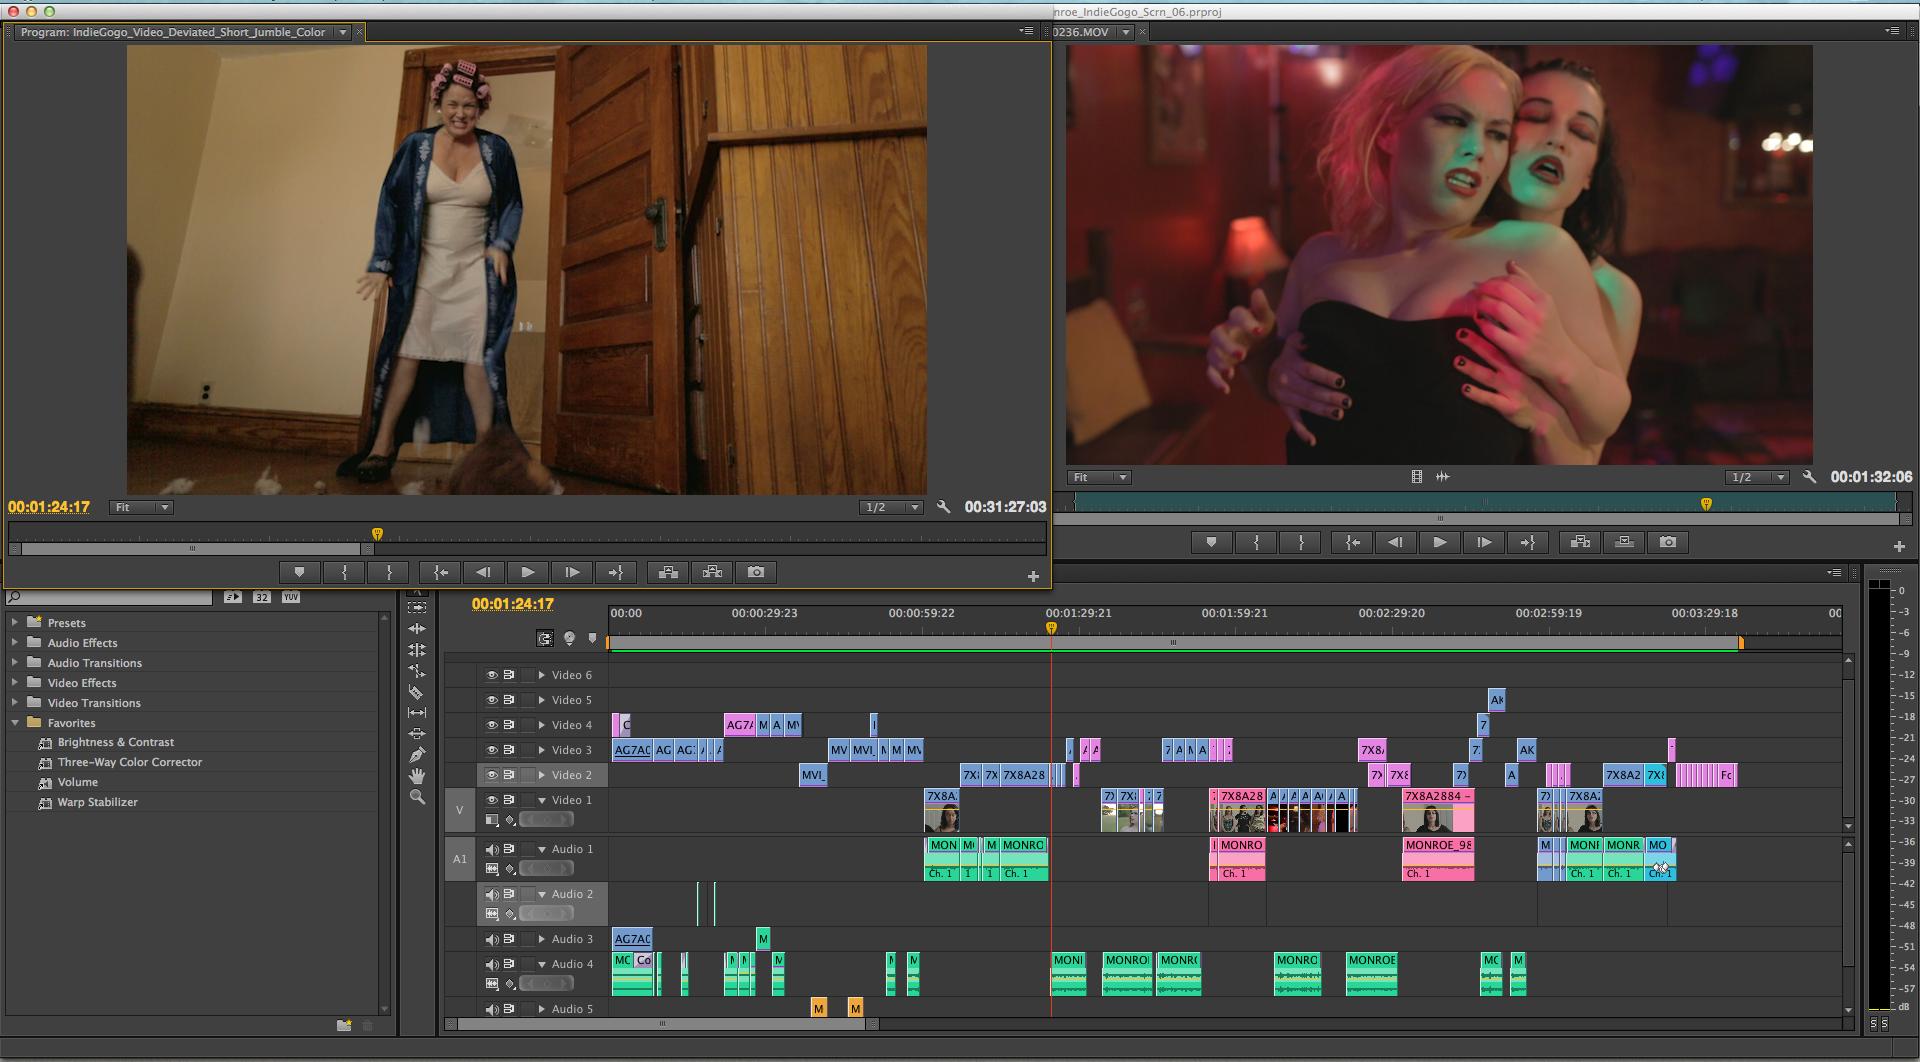 Geena Matuson (@geenamatuson) edits IndieGogo campaign video to finish second half of 'I Am Monroe?'